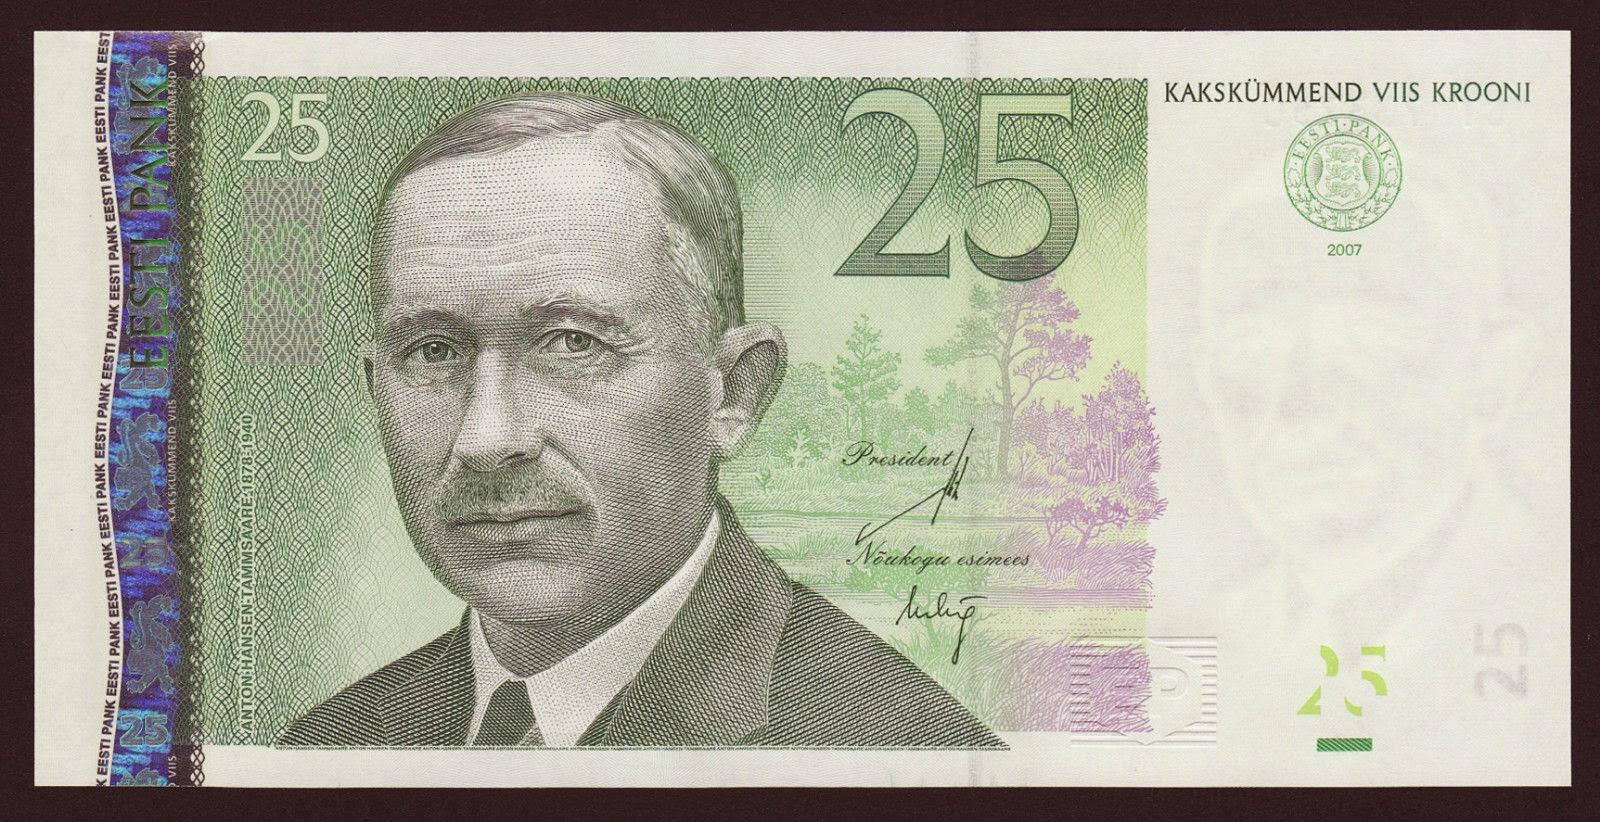 Estonia currency money 25 krooni banknote, Anton Hansen Tammsaare